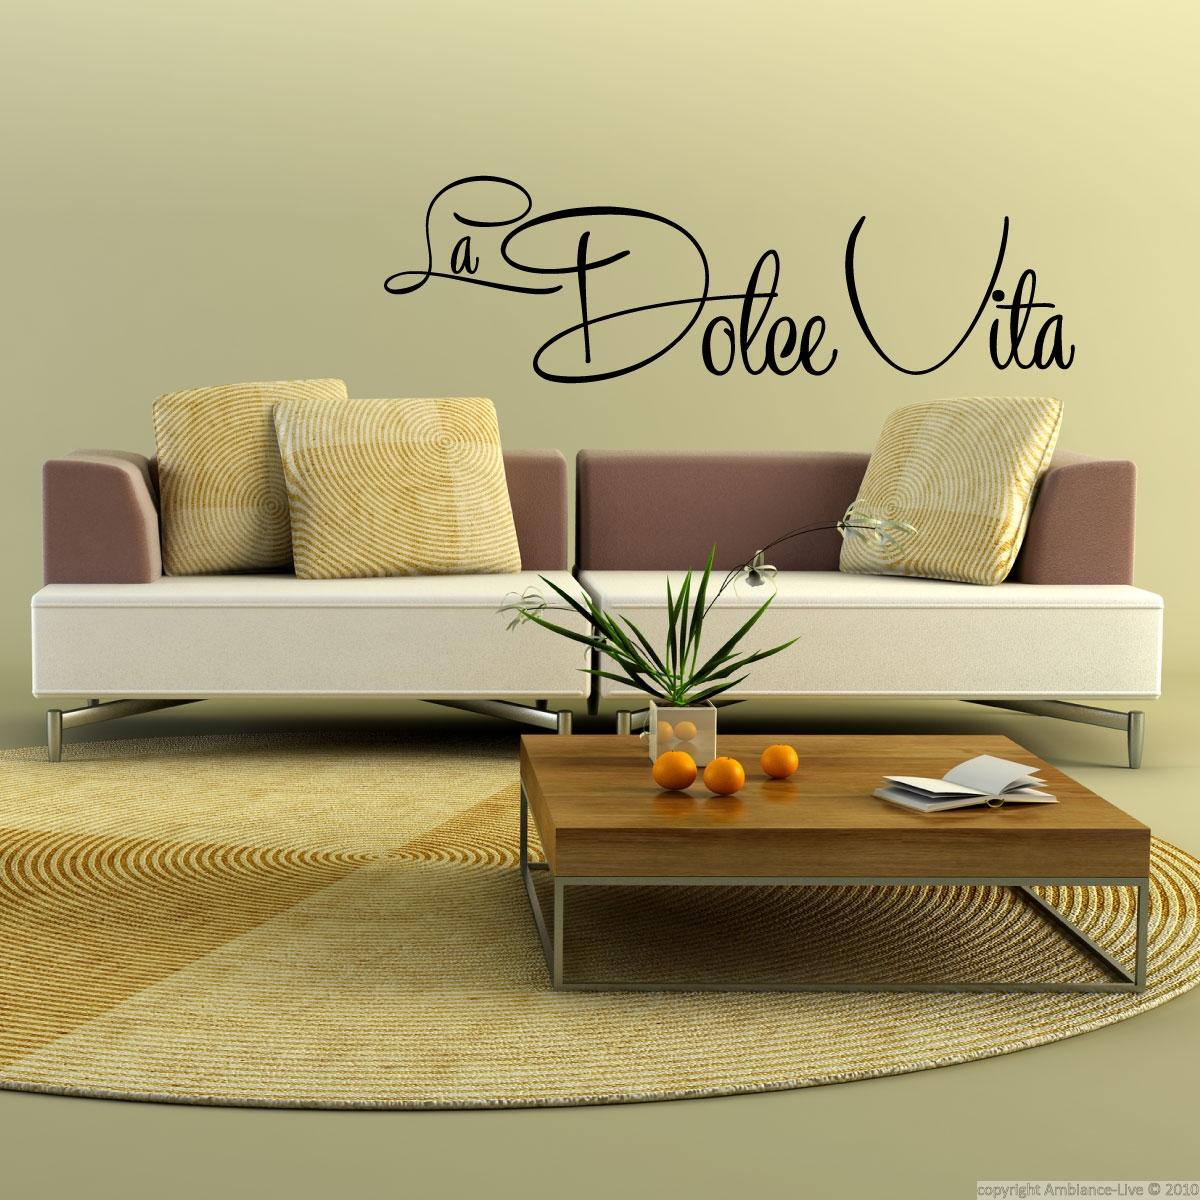 La Dolce Vita Wall Decal Quotes Pinterest # Muebles Dolce Vita